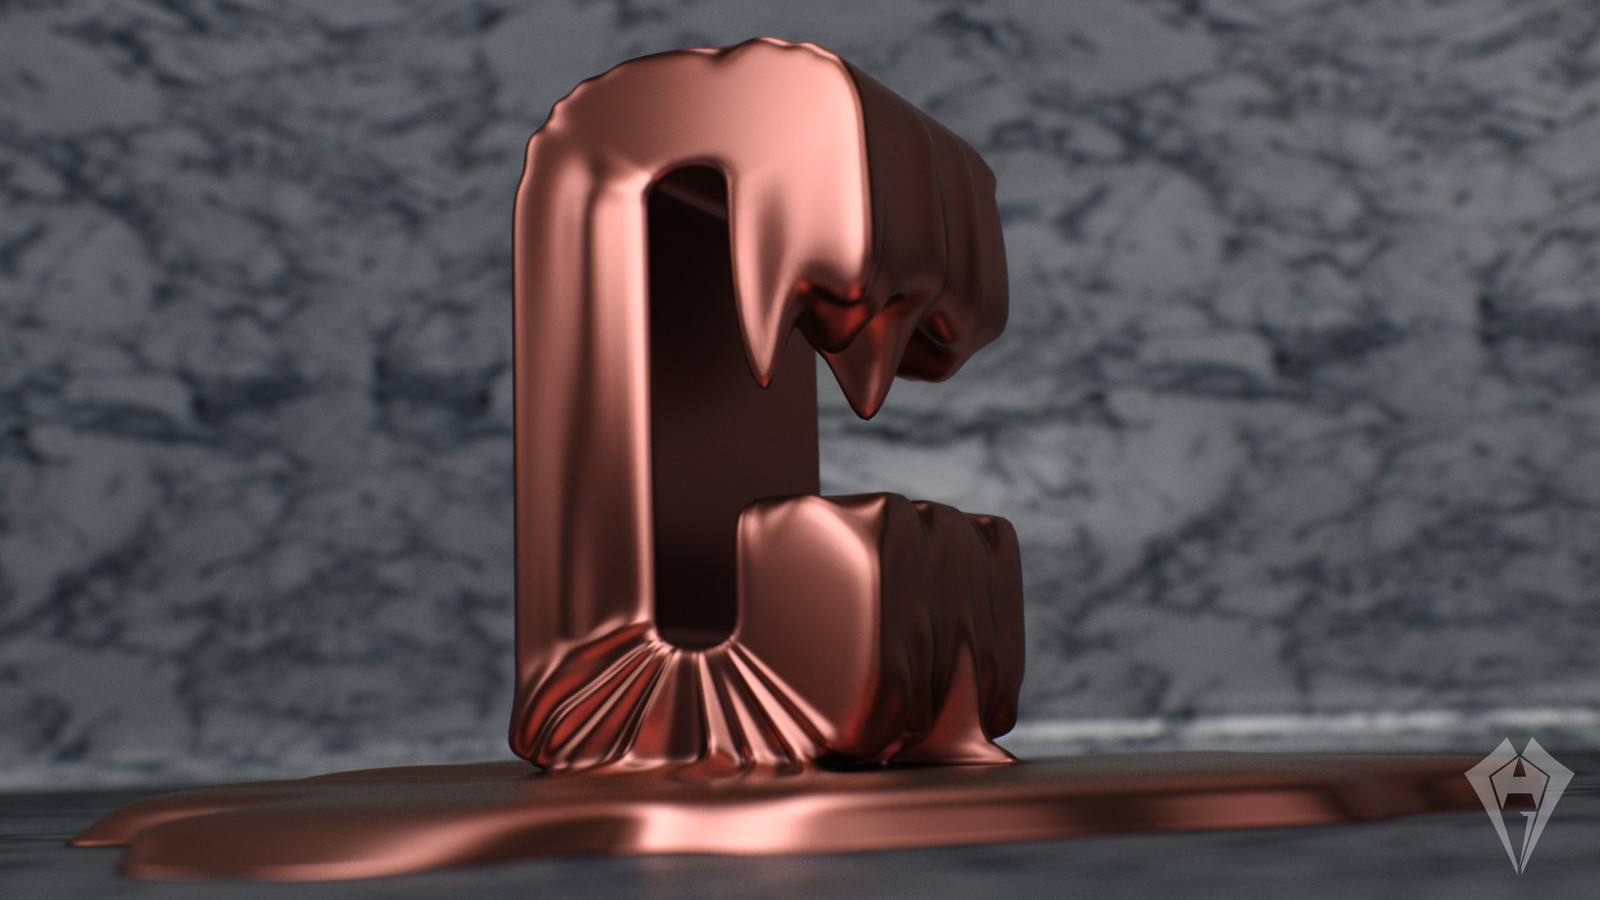 C for Copper by hugo matilde